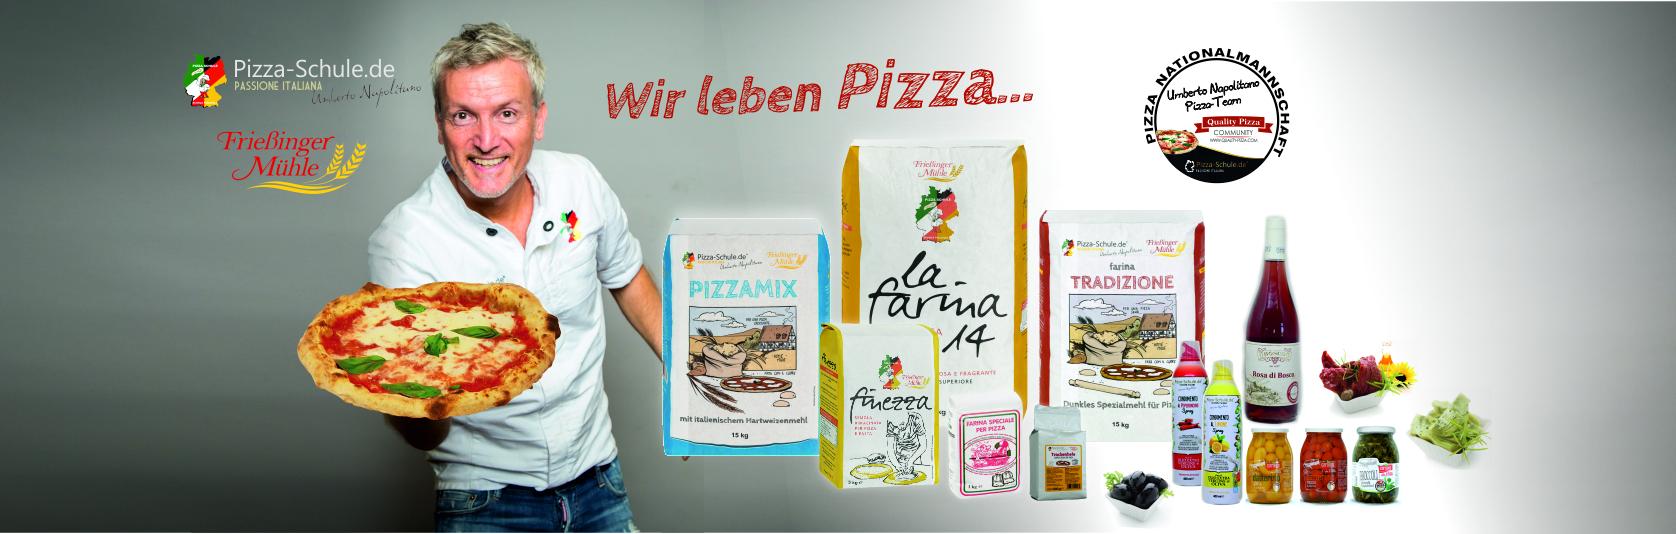 Pizzeria-Produktlinie Pizza-Schule - Umberto Napolitano 2019